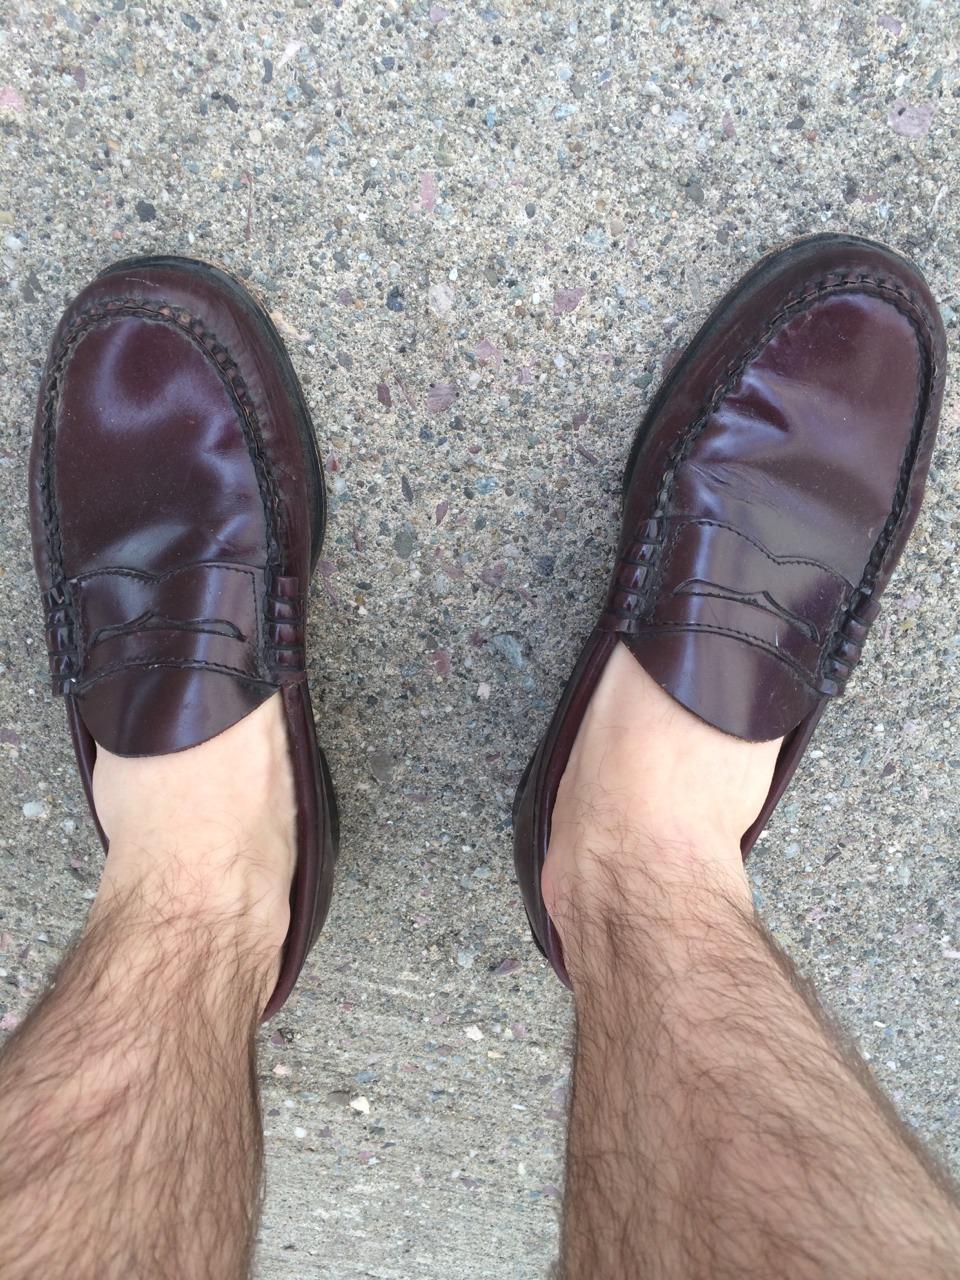 Sockless!